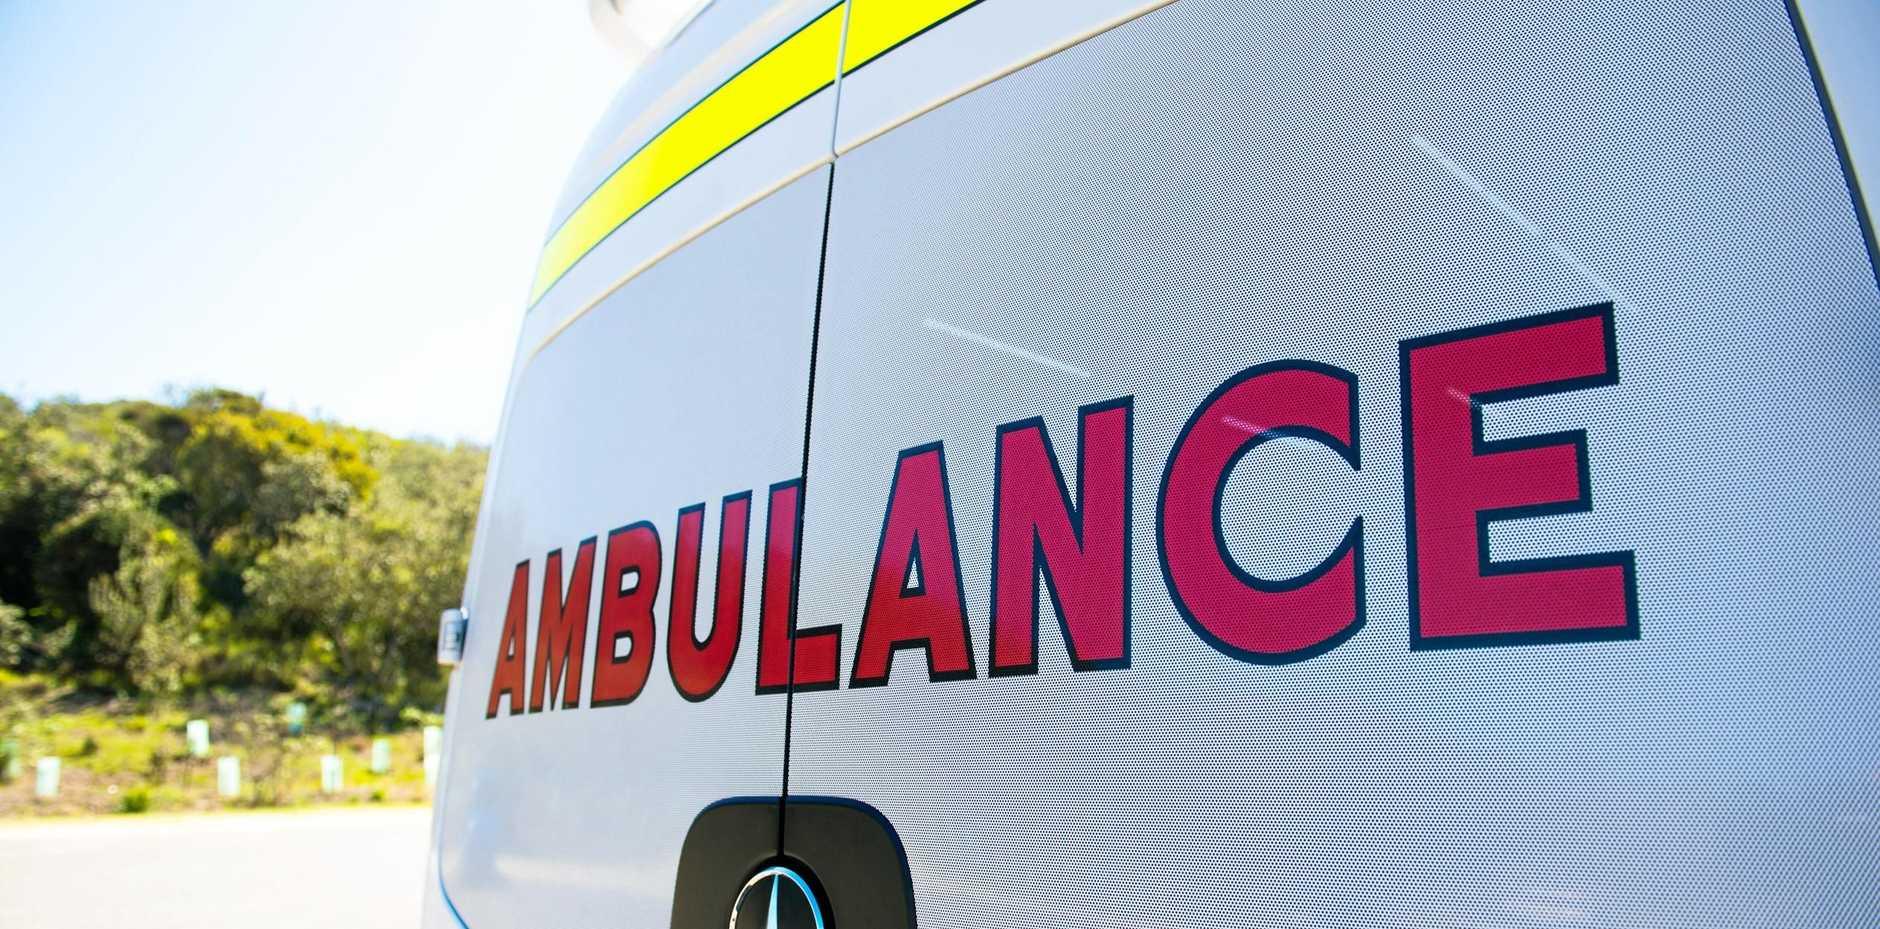 Ambulance were called on scene at 1am.